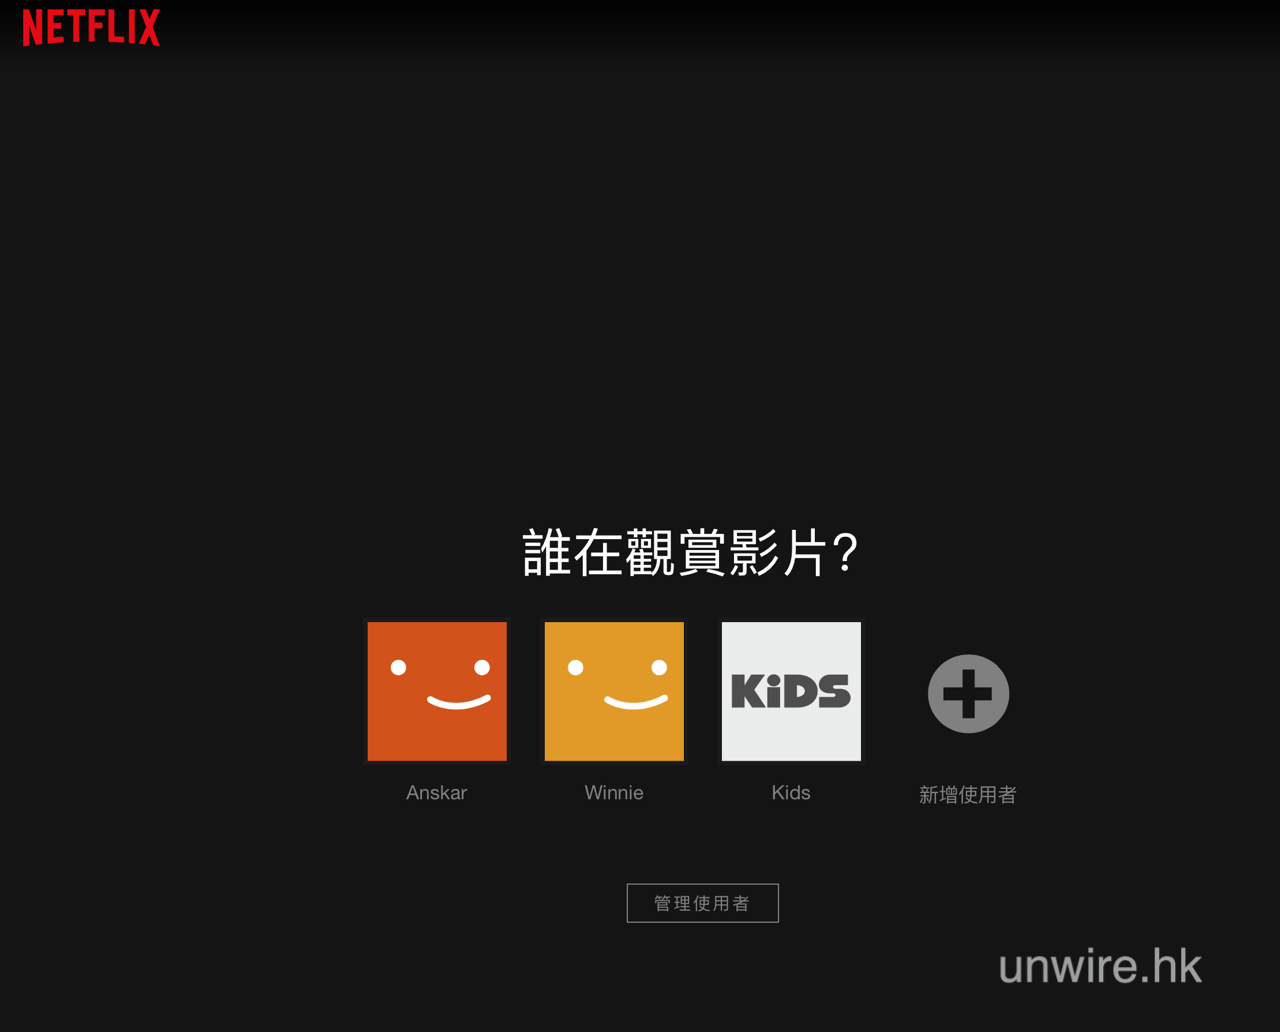 Netflix HK 正式登場 ! 香港月費表 + 新手 15 問 + 安裝懶人包 - 香港 unwire.hk